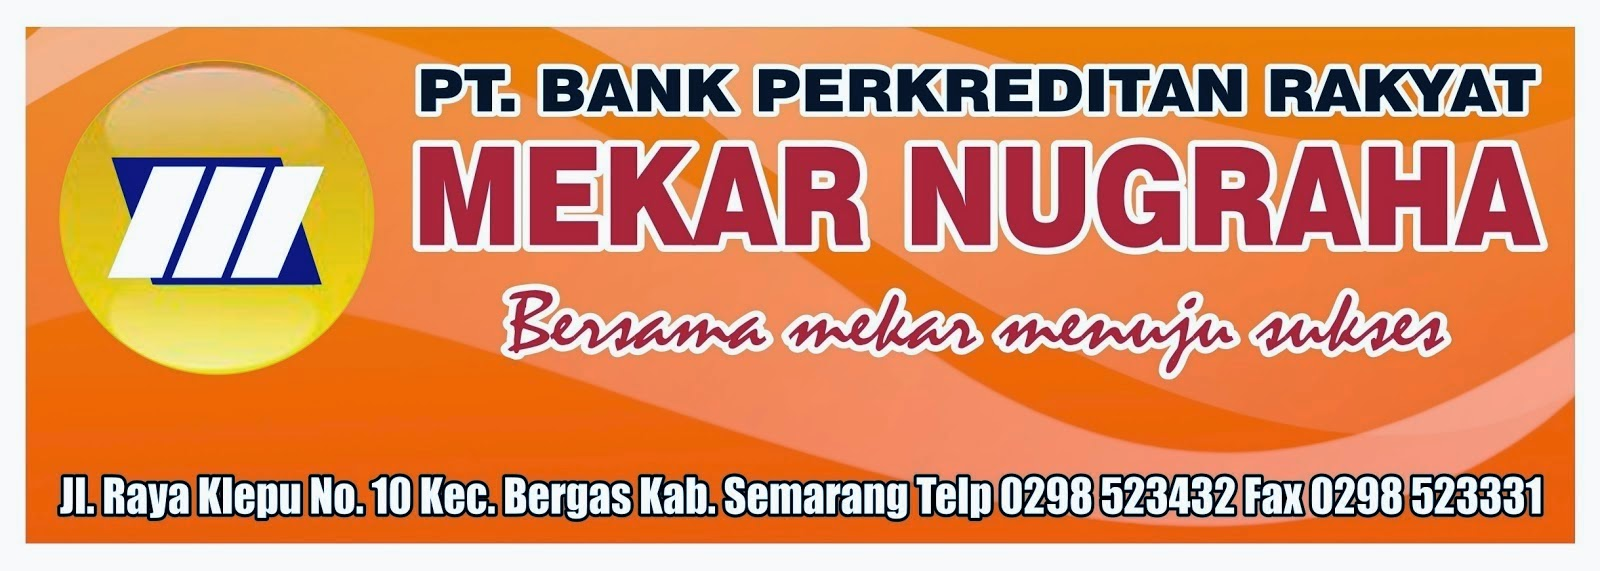 infolokersoloraya.blogspot.com Terbaru April 2014 di PT. BPR Mekar Nugraha - Boyolali